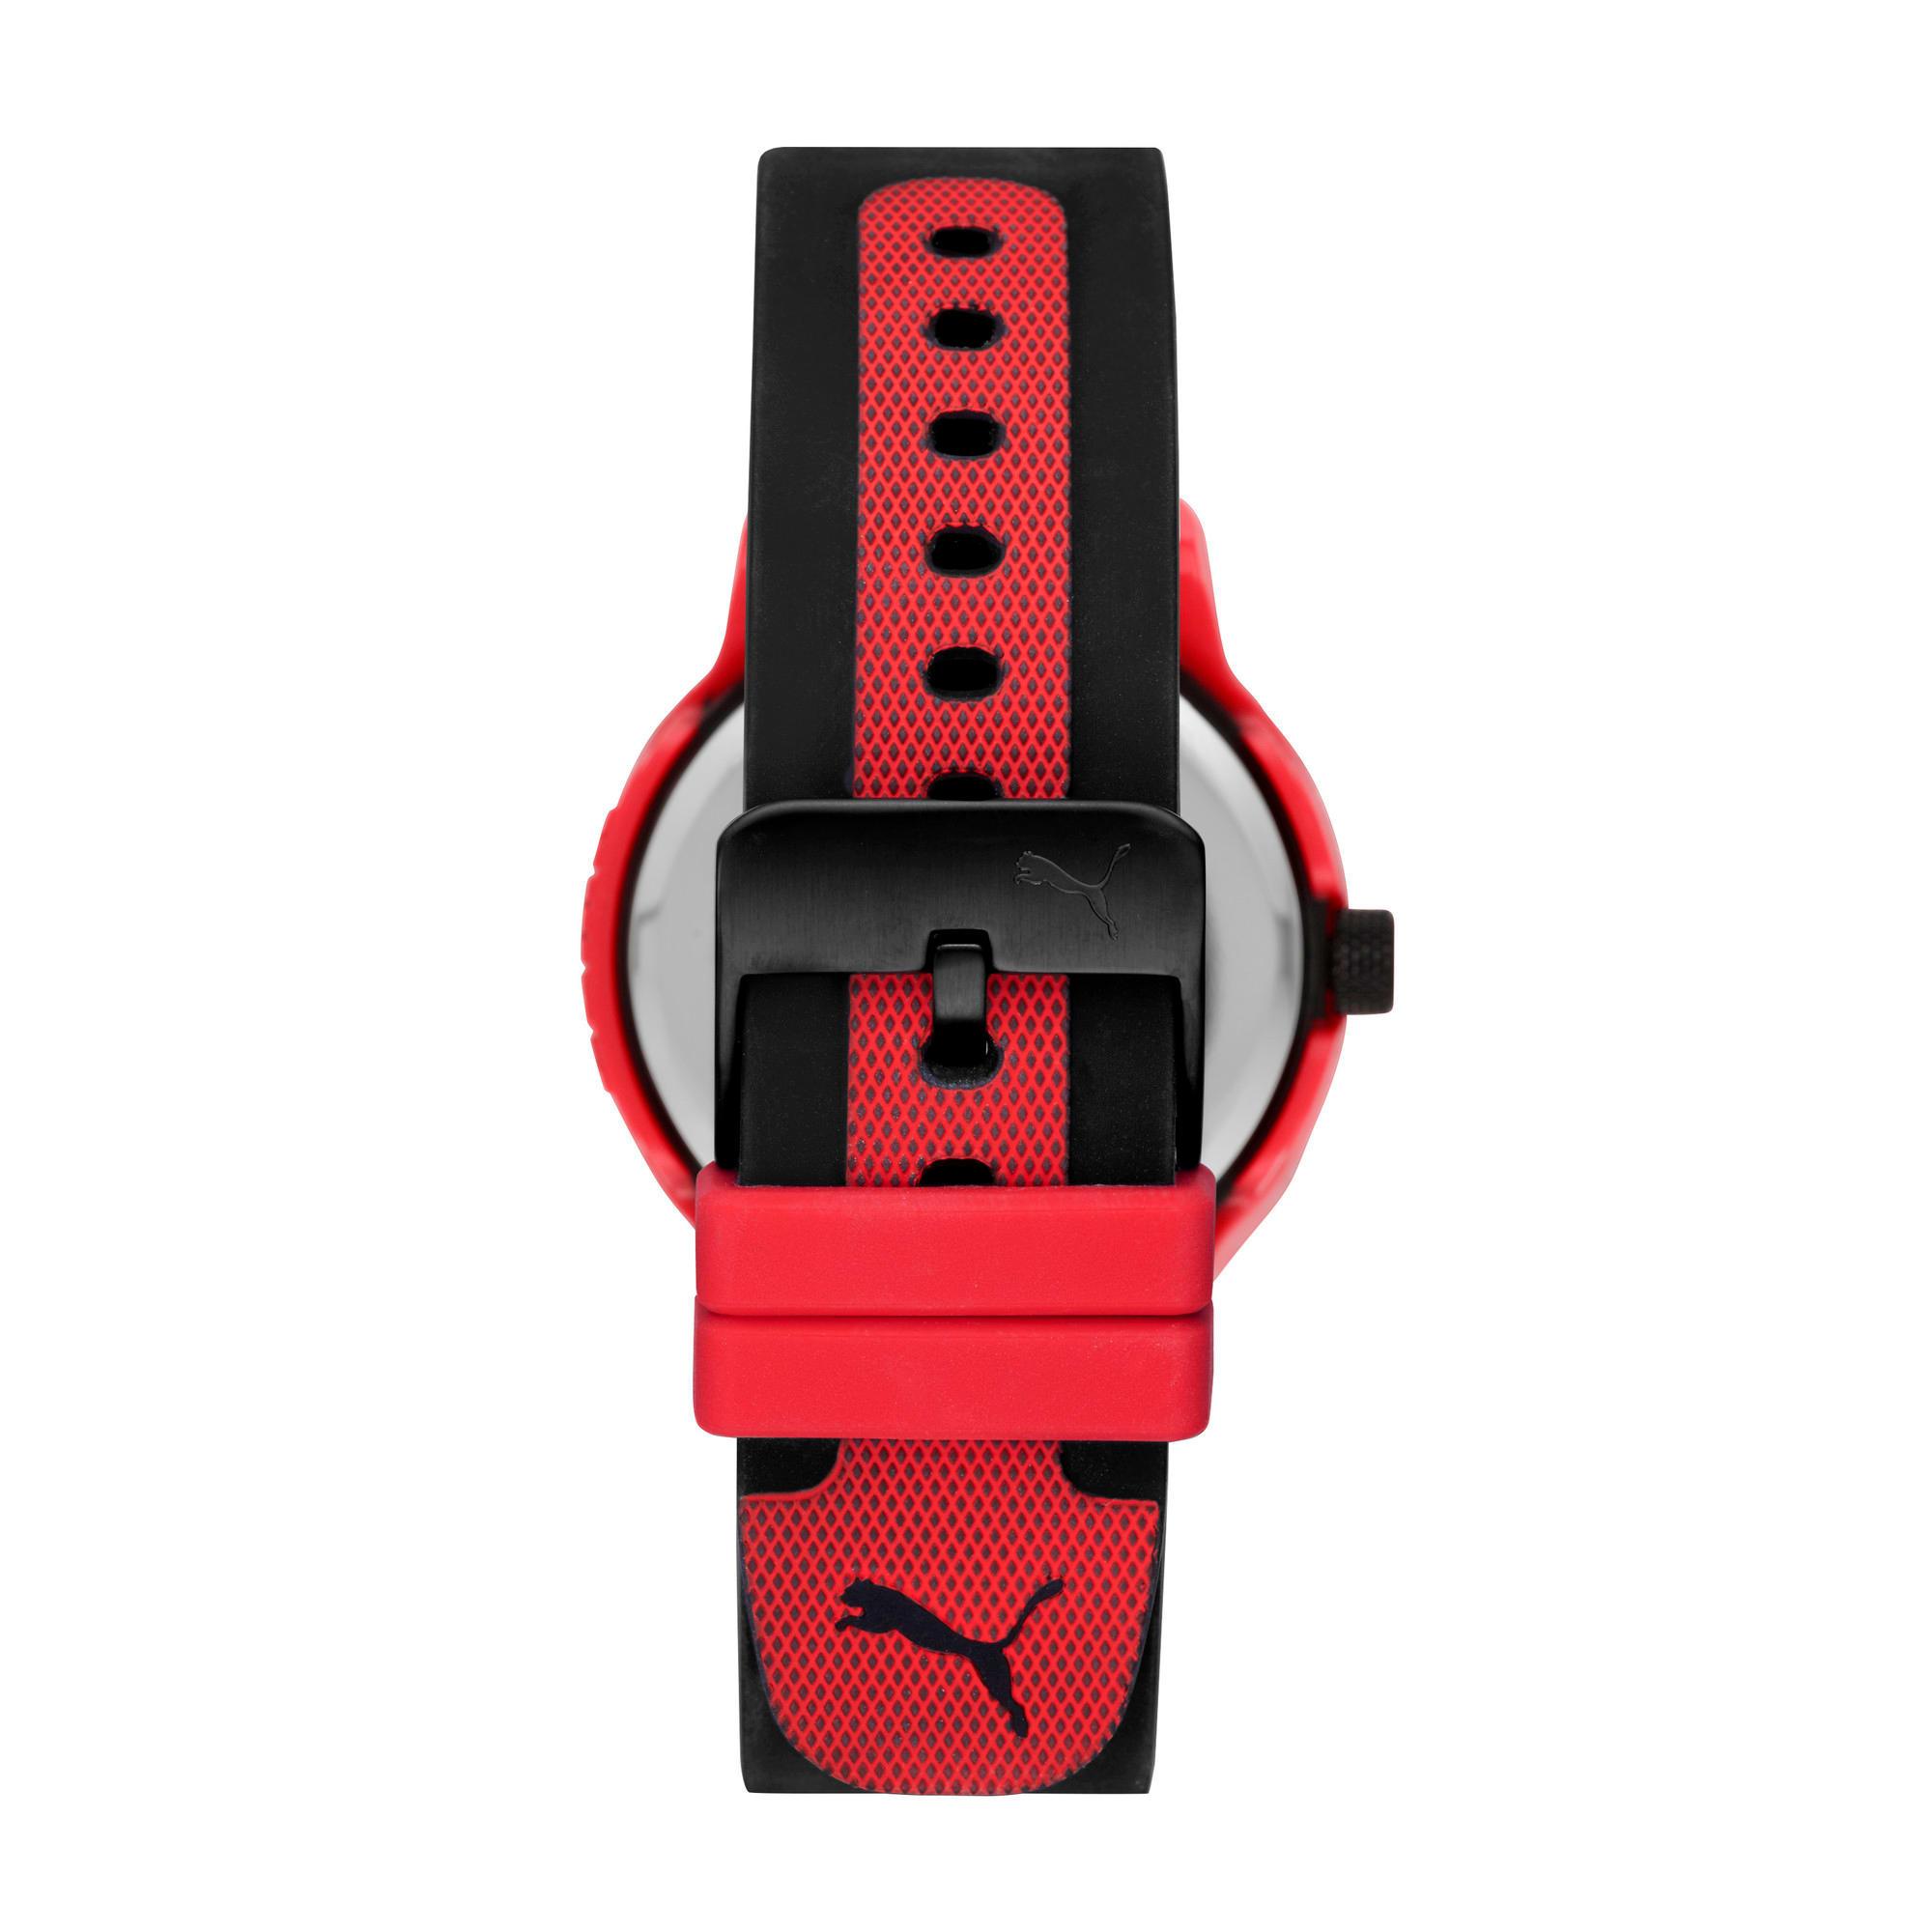 Thumbnail 3 of Reset v1 Watch, Red/Black, medium